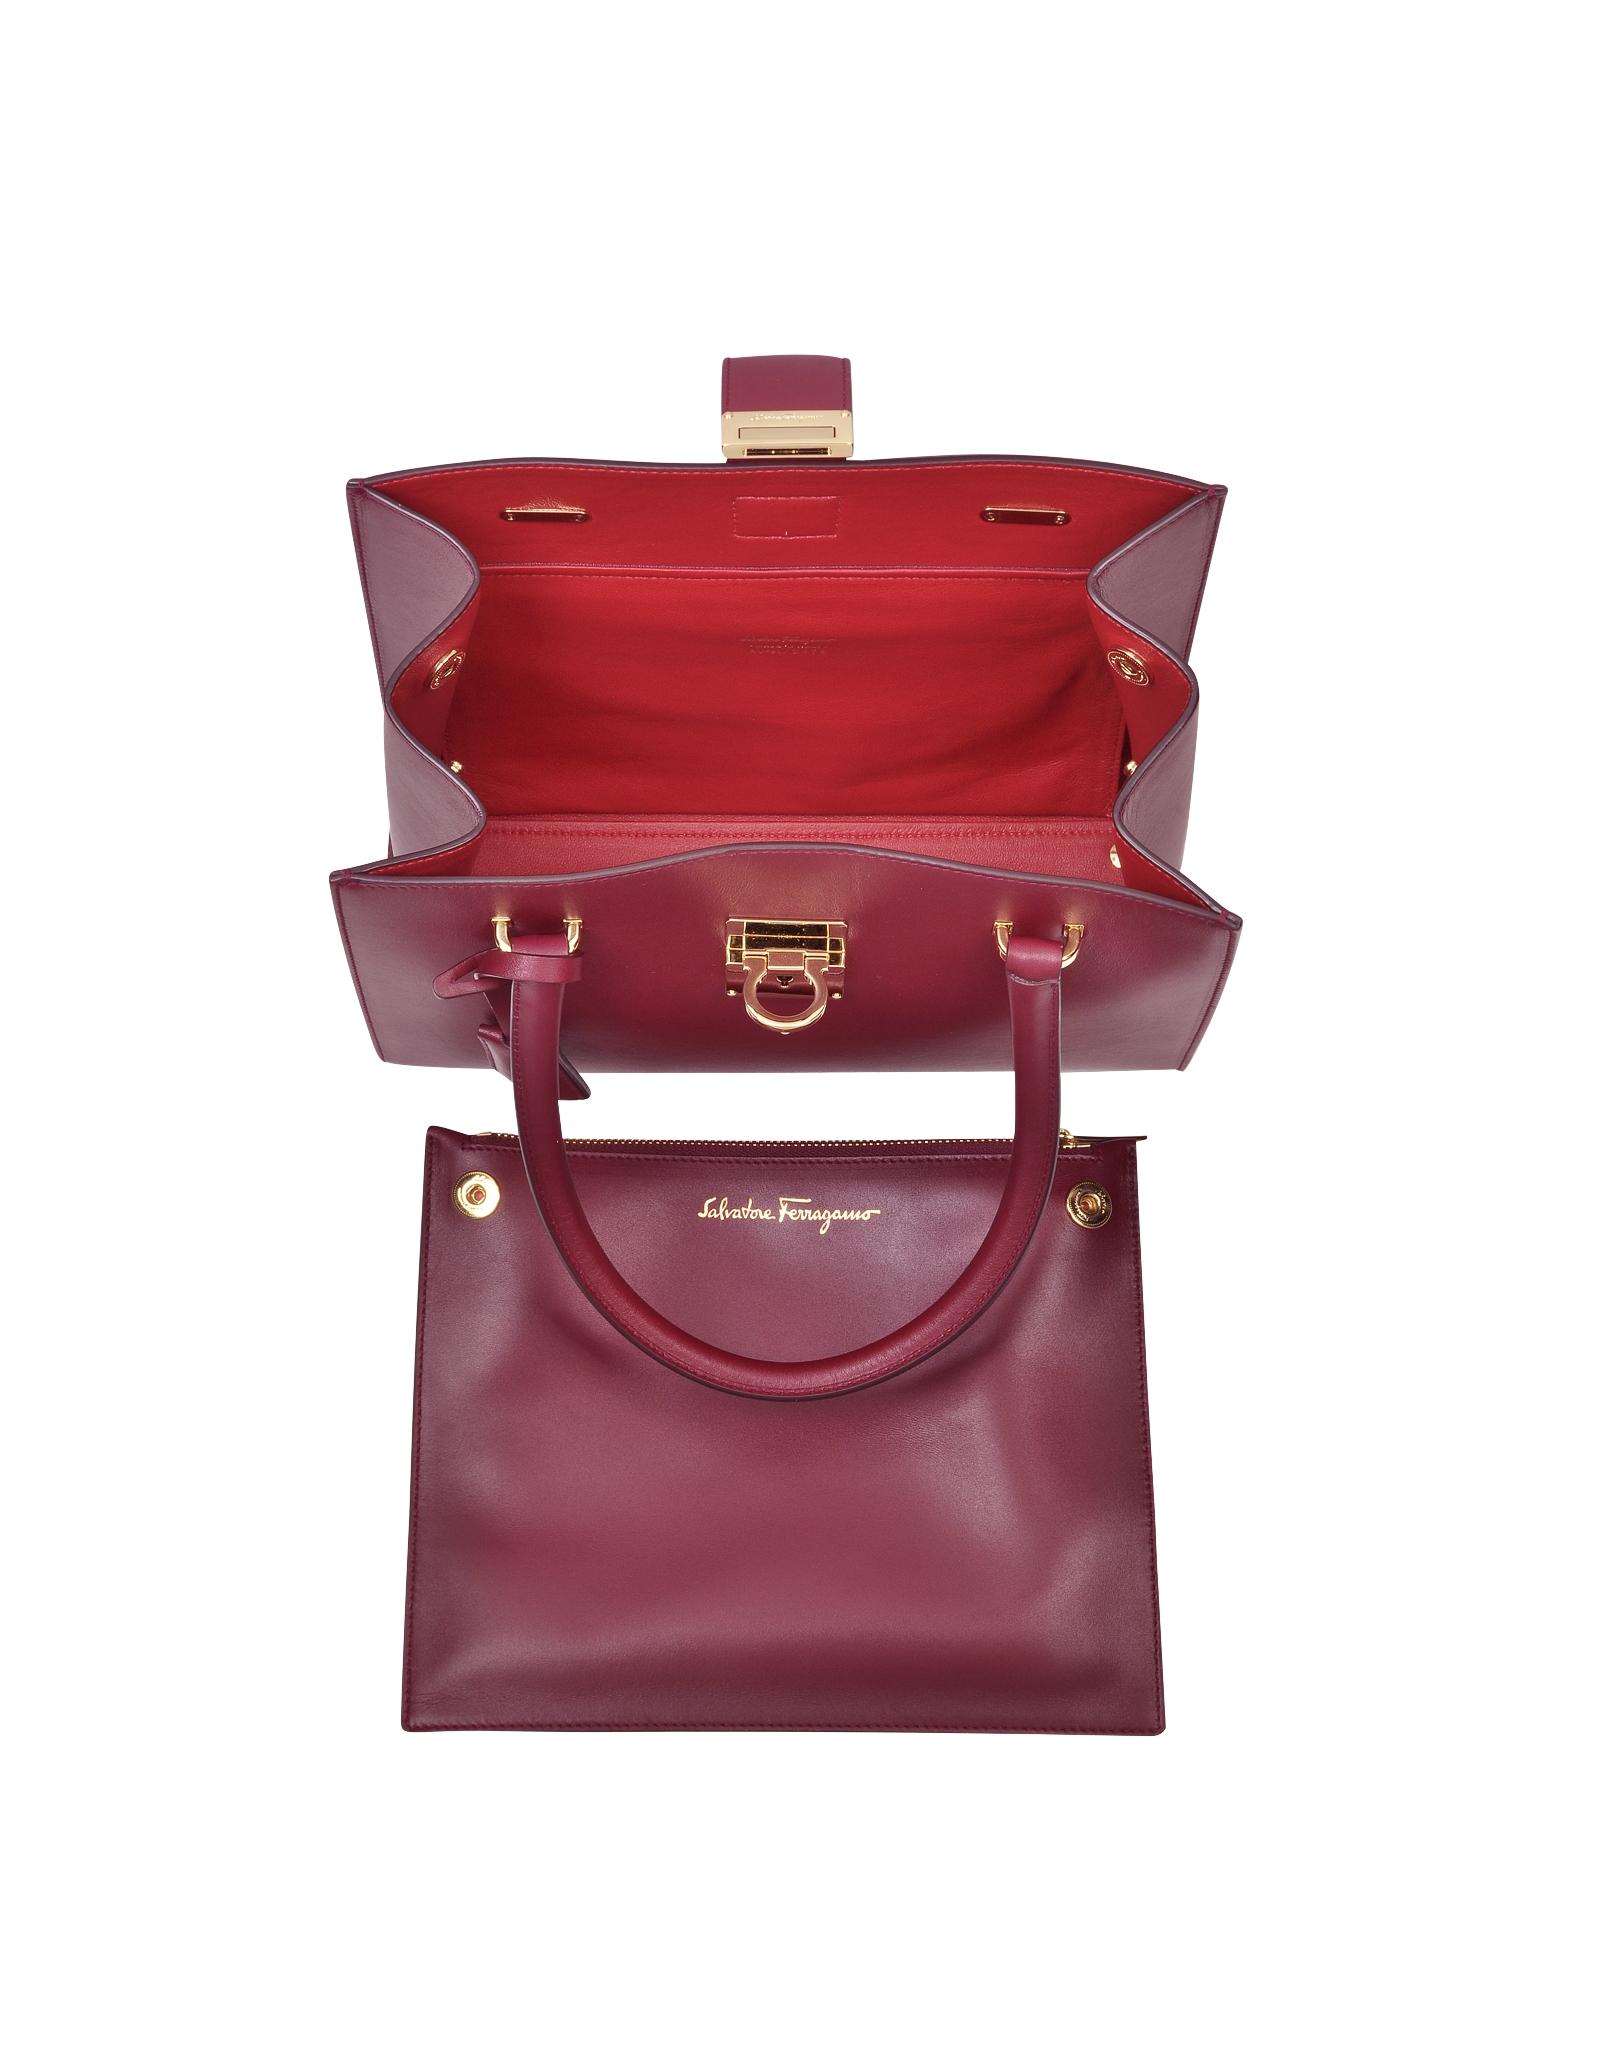 Lyst - Ferragamo Juliette Burgundy Leather Tote in Red e2570ee3a402f